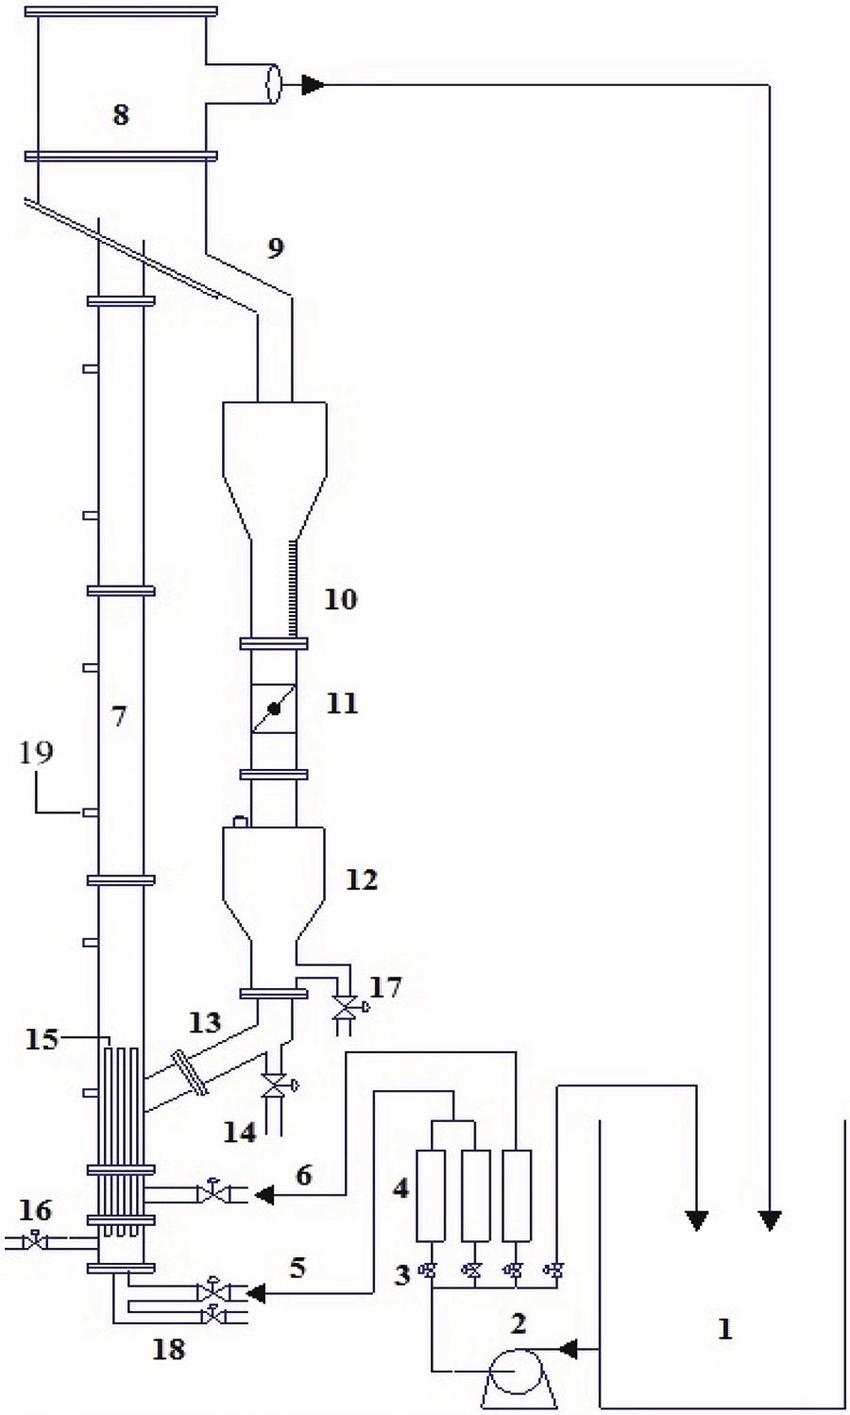 hight resolution of schematic diagram of the experimental setup 1 liquid reservoir 2 pump 3 valve 4 flow meter 5 primary liquid inlet 6 auxiliary liquid inlet